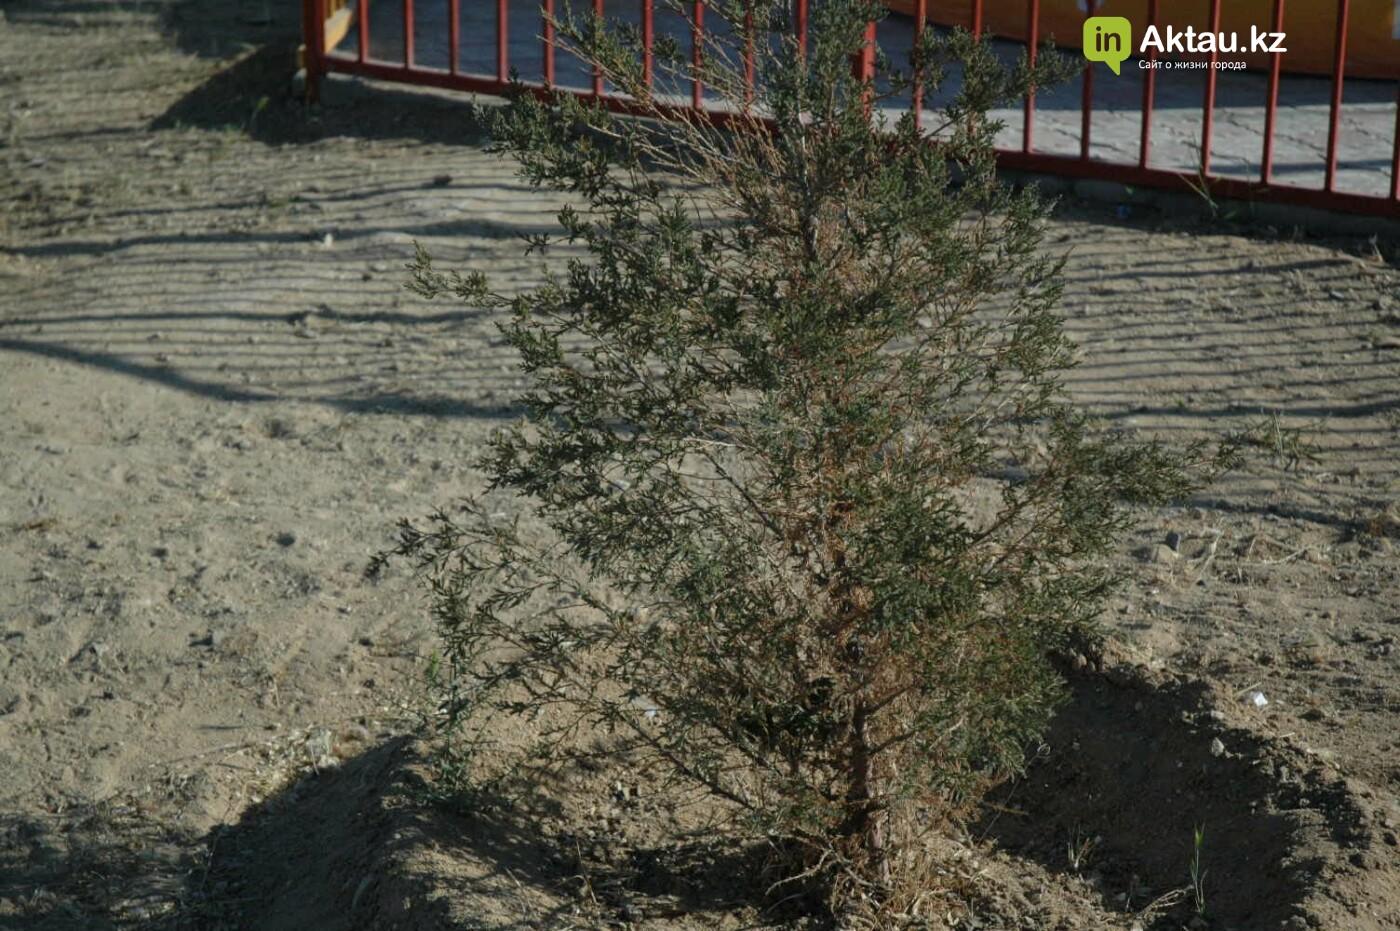 Погибшие от засухи и обезвоживания в Актау исчисляются десятками (ФОТО), фото-13